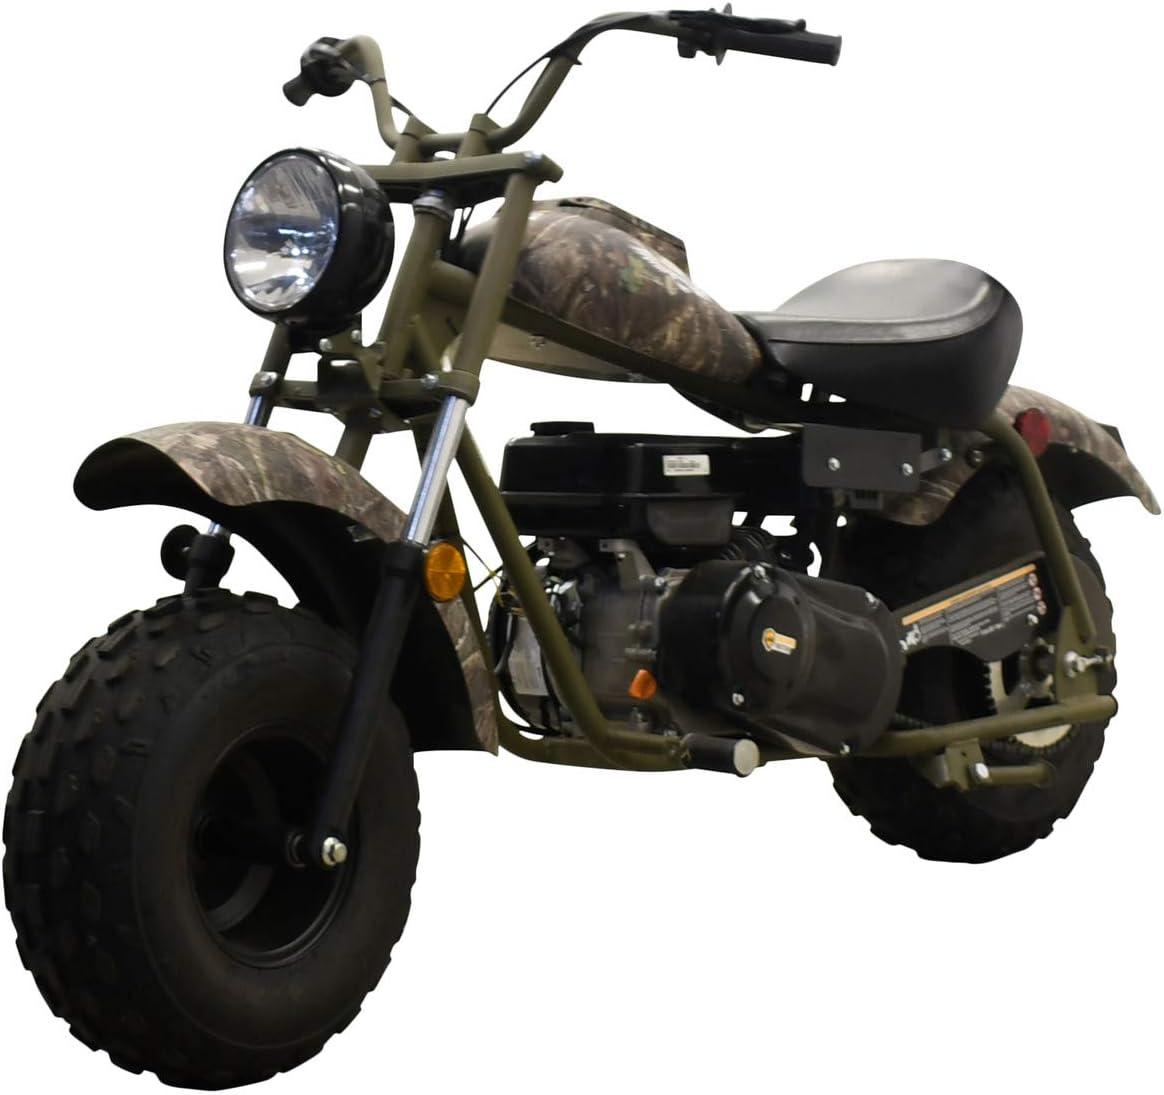 Massimo Motor Warrior200 196CC